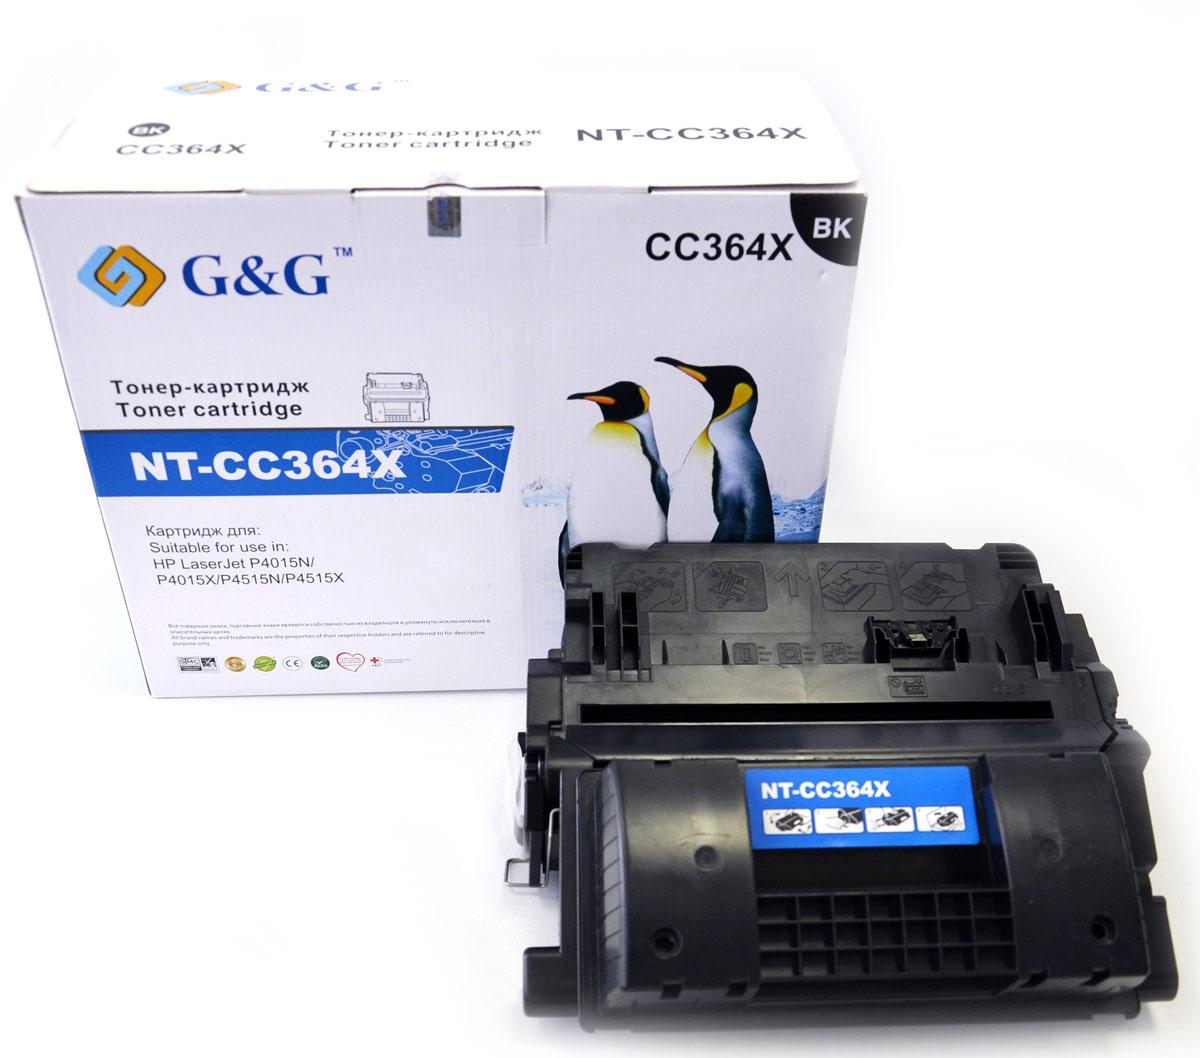 G&G NT-CC364X тонер-картридж для HP laserJet P4015N/P4015X/P4515N/P4515X